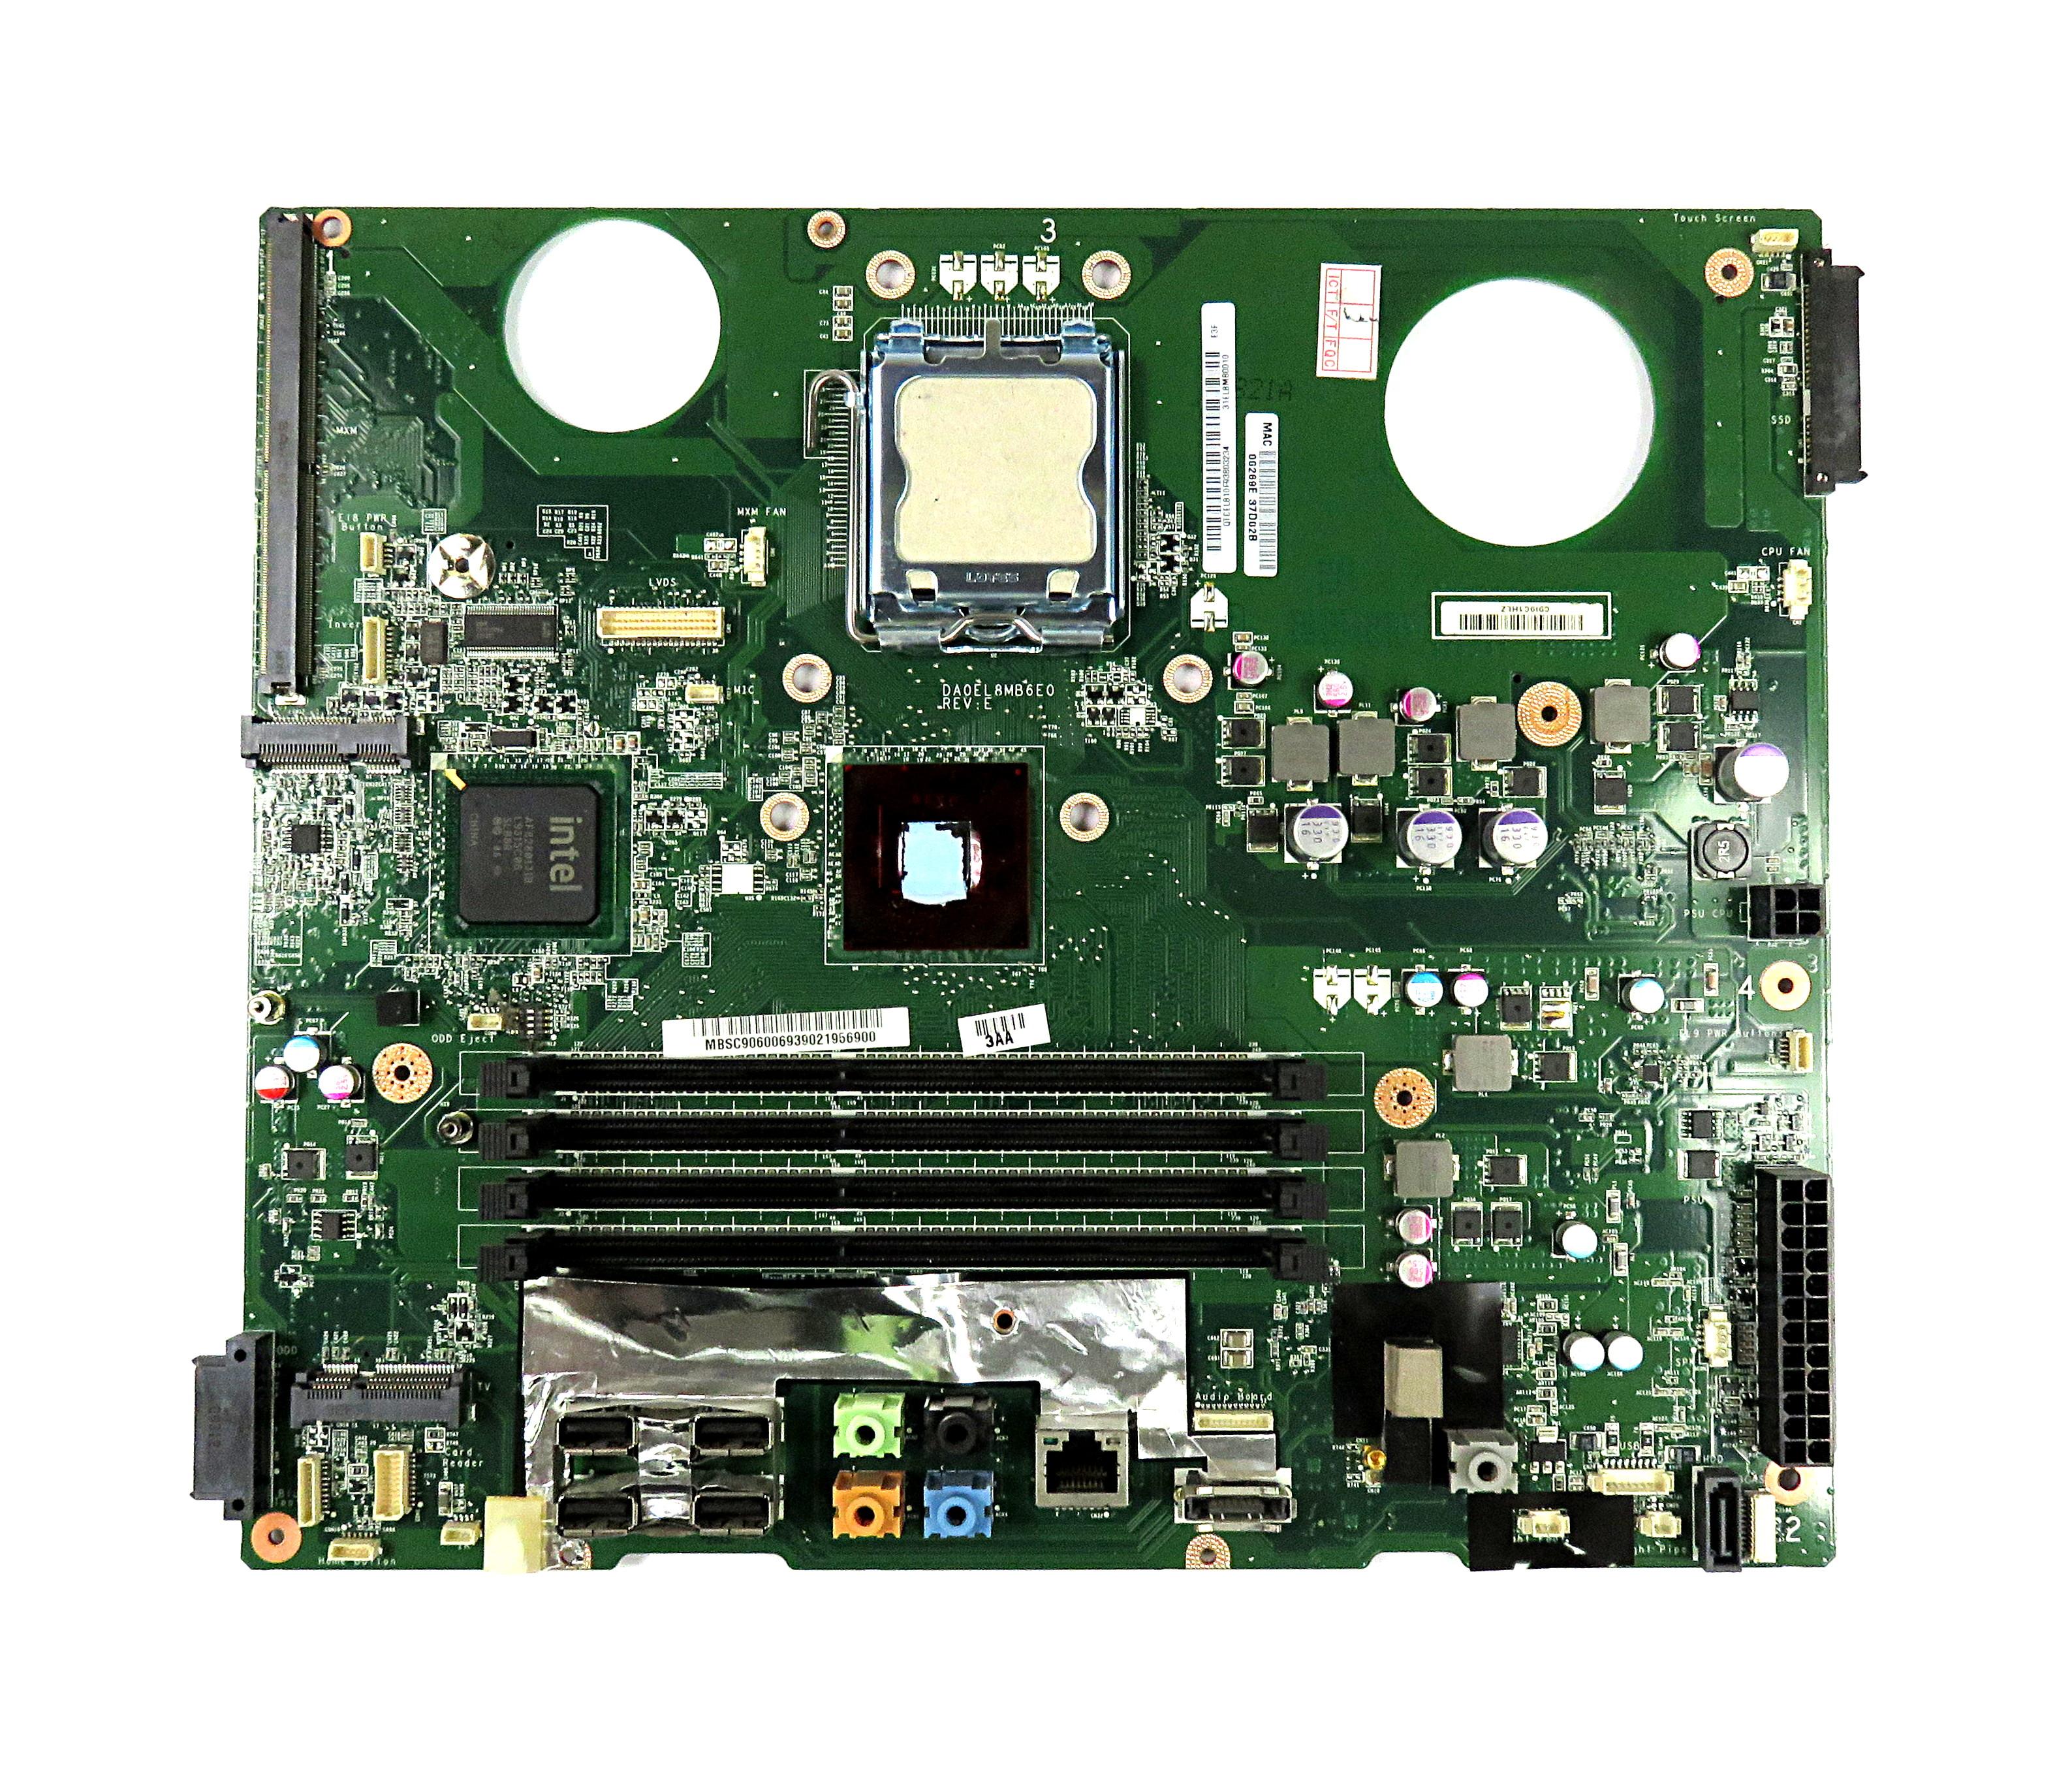 DA0EL8MB6F0 Rev:F MB.SC906.006 Acer Aspire Z5610 AiO Motherboard